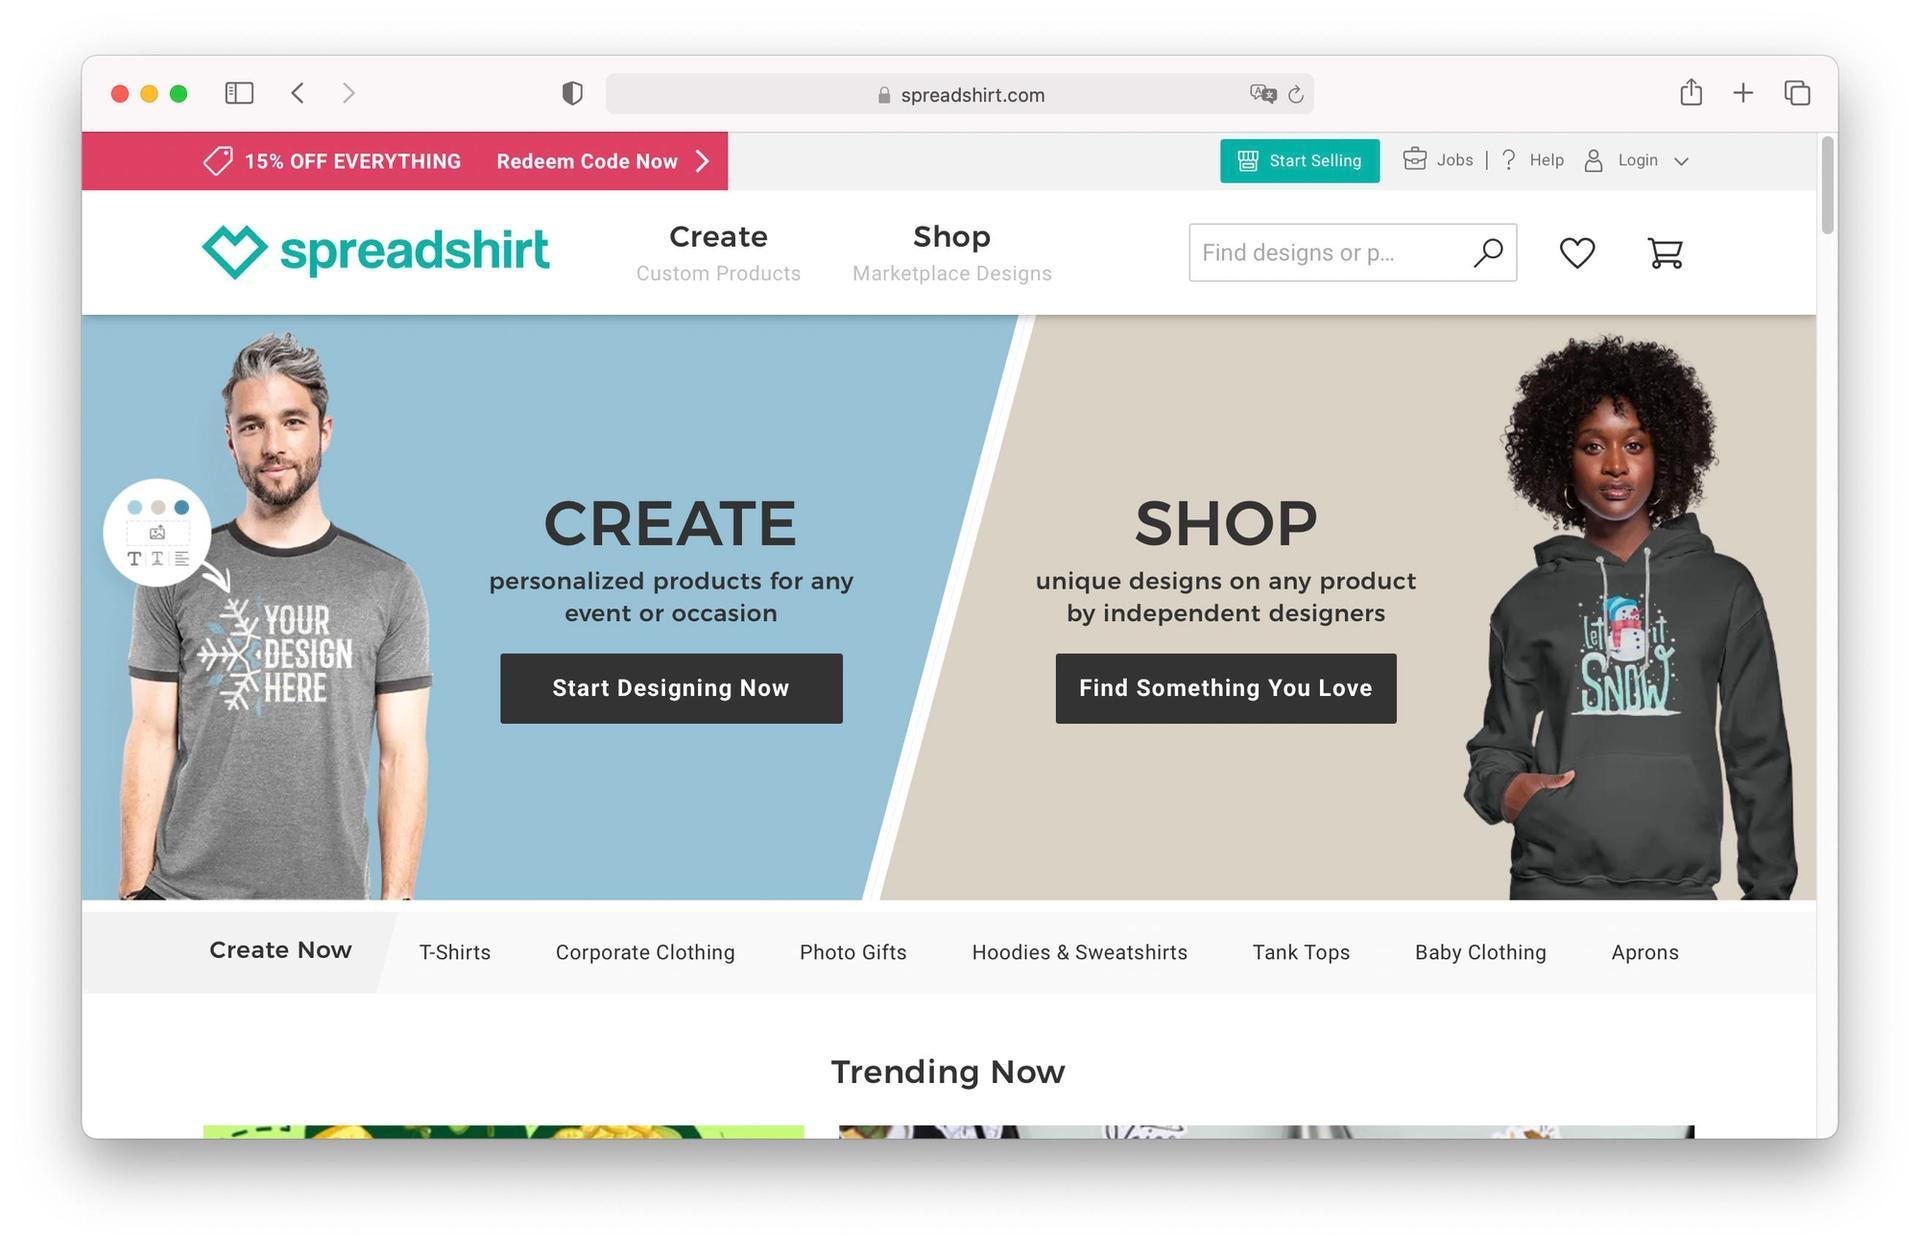 Spreadshirt homepage